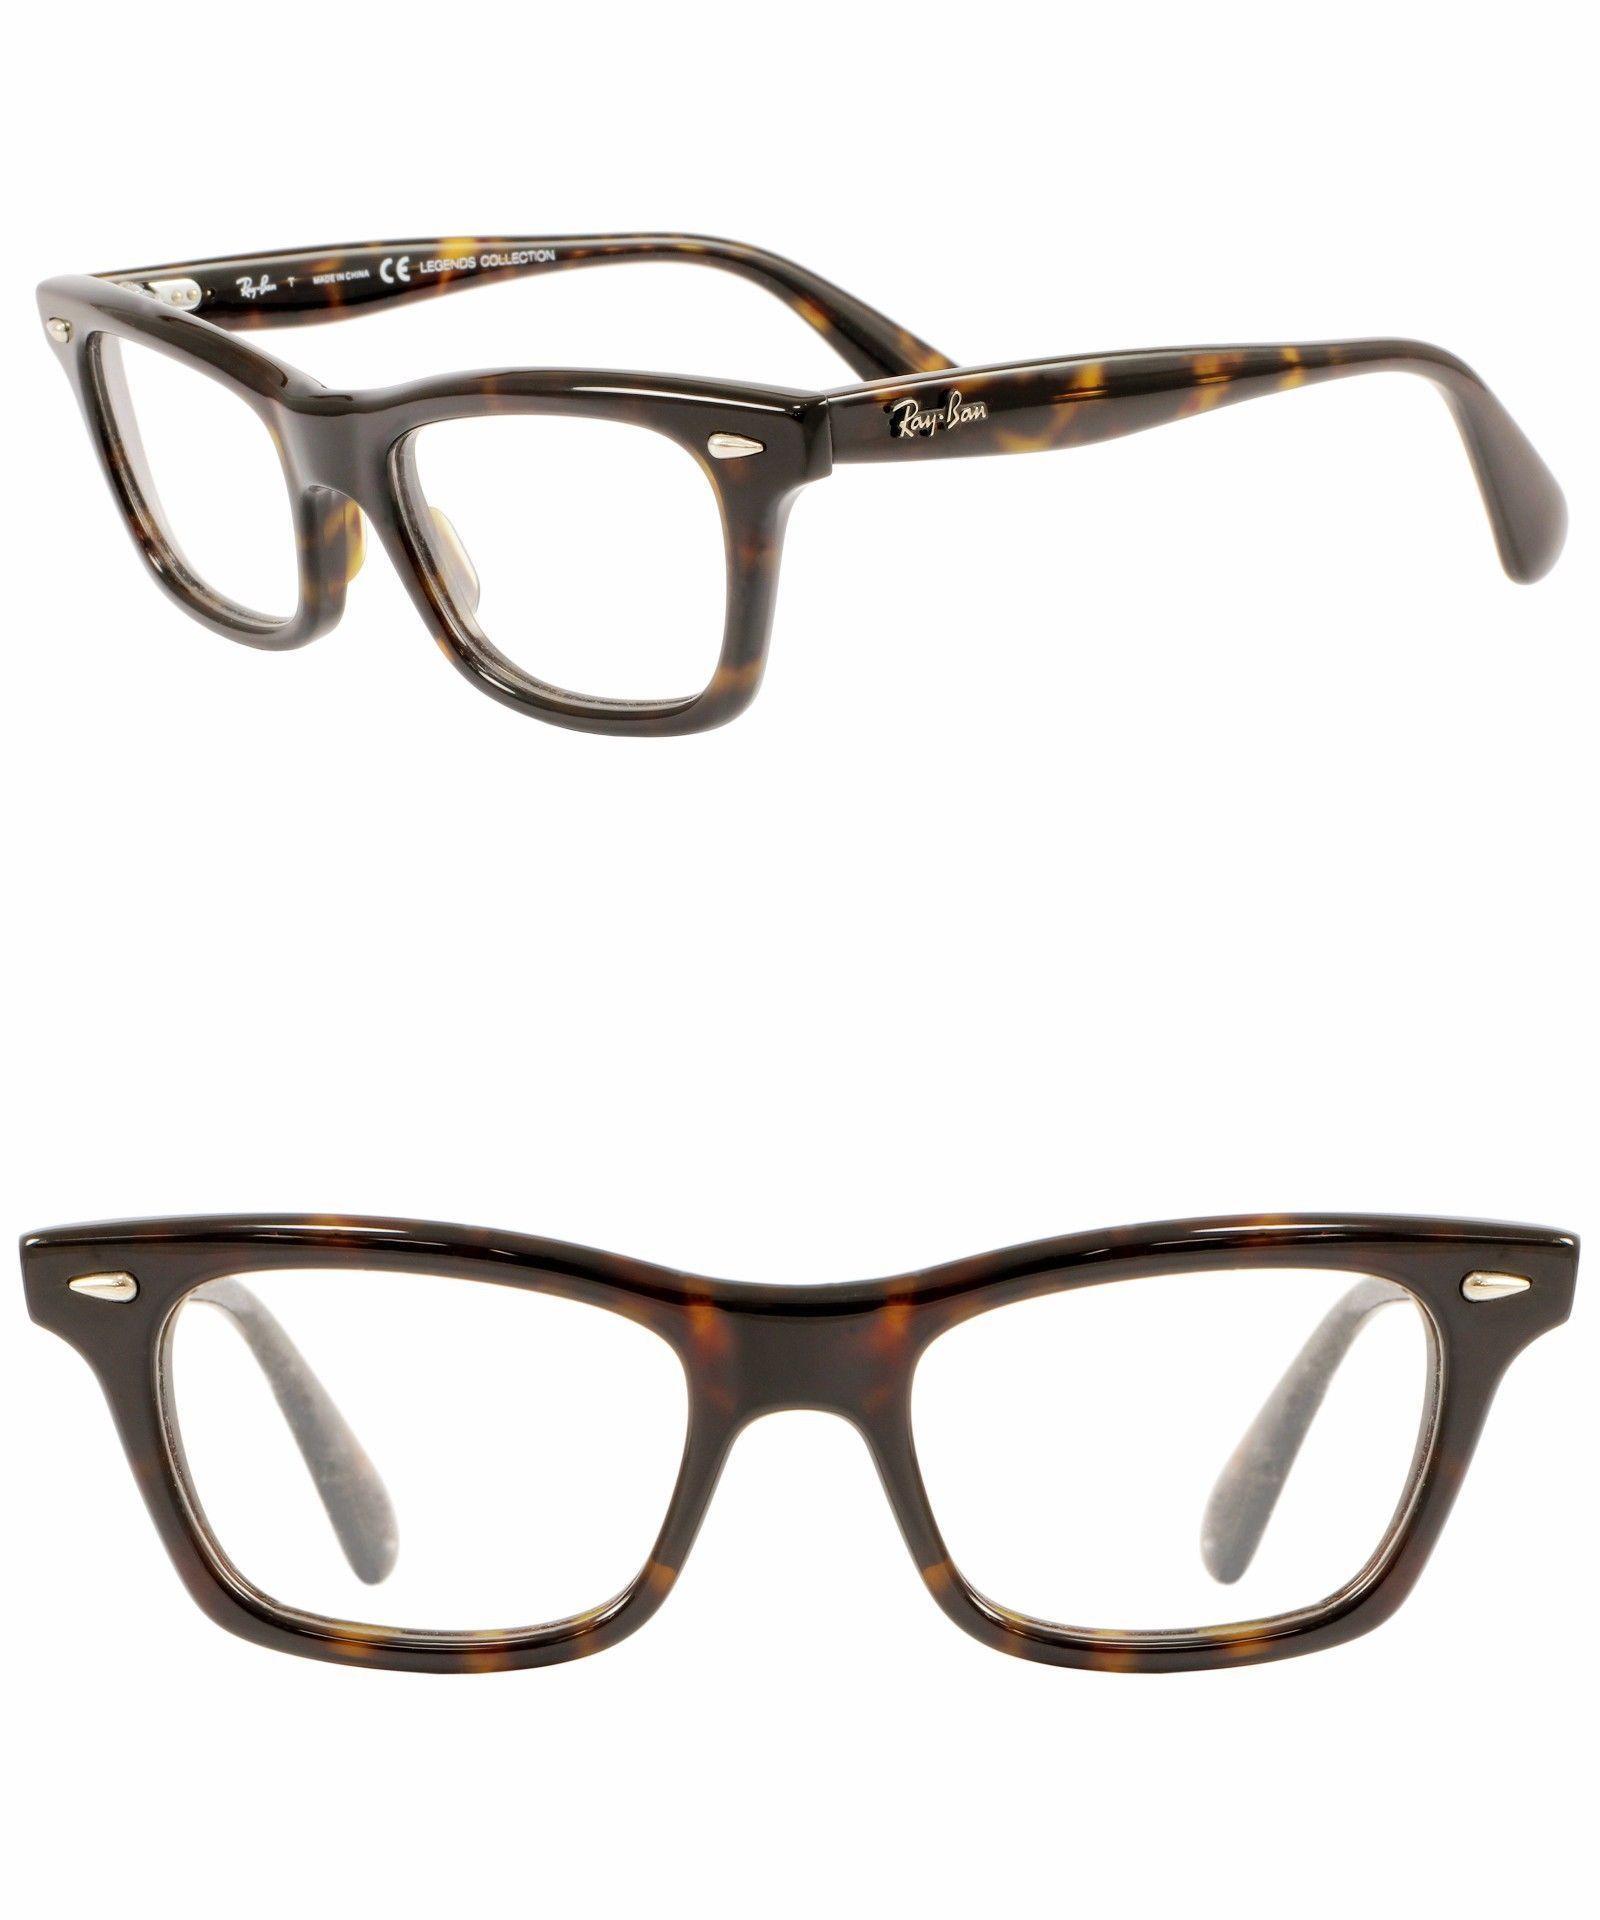 bb447cb95f029 Fashion Eyewear Clear Glasses 179240  Ray-Ban Rb 5281 2012 Unisex Brown  Tortoise Optical Rx Eyeglasses 51Mm - 247 -  BUY IT NOW ONLY   70.98 on  eBay!